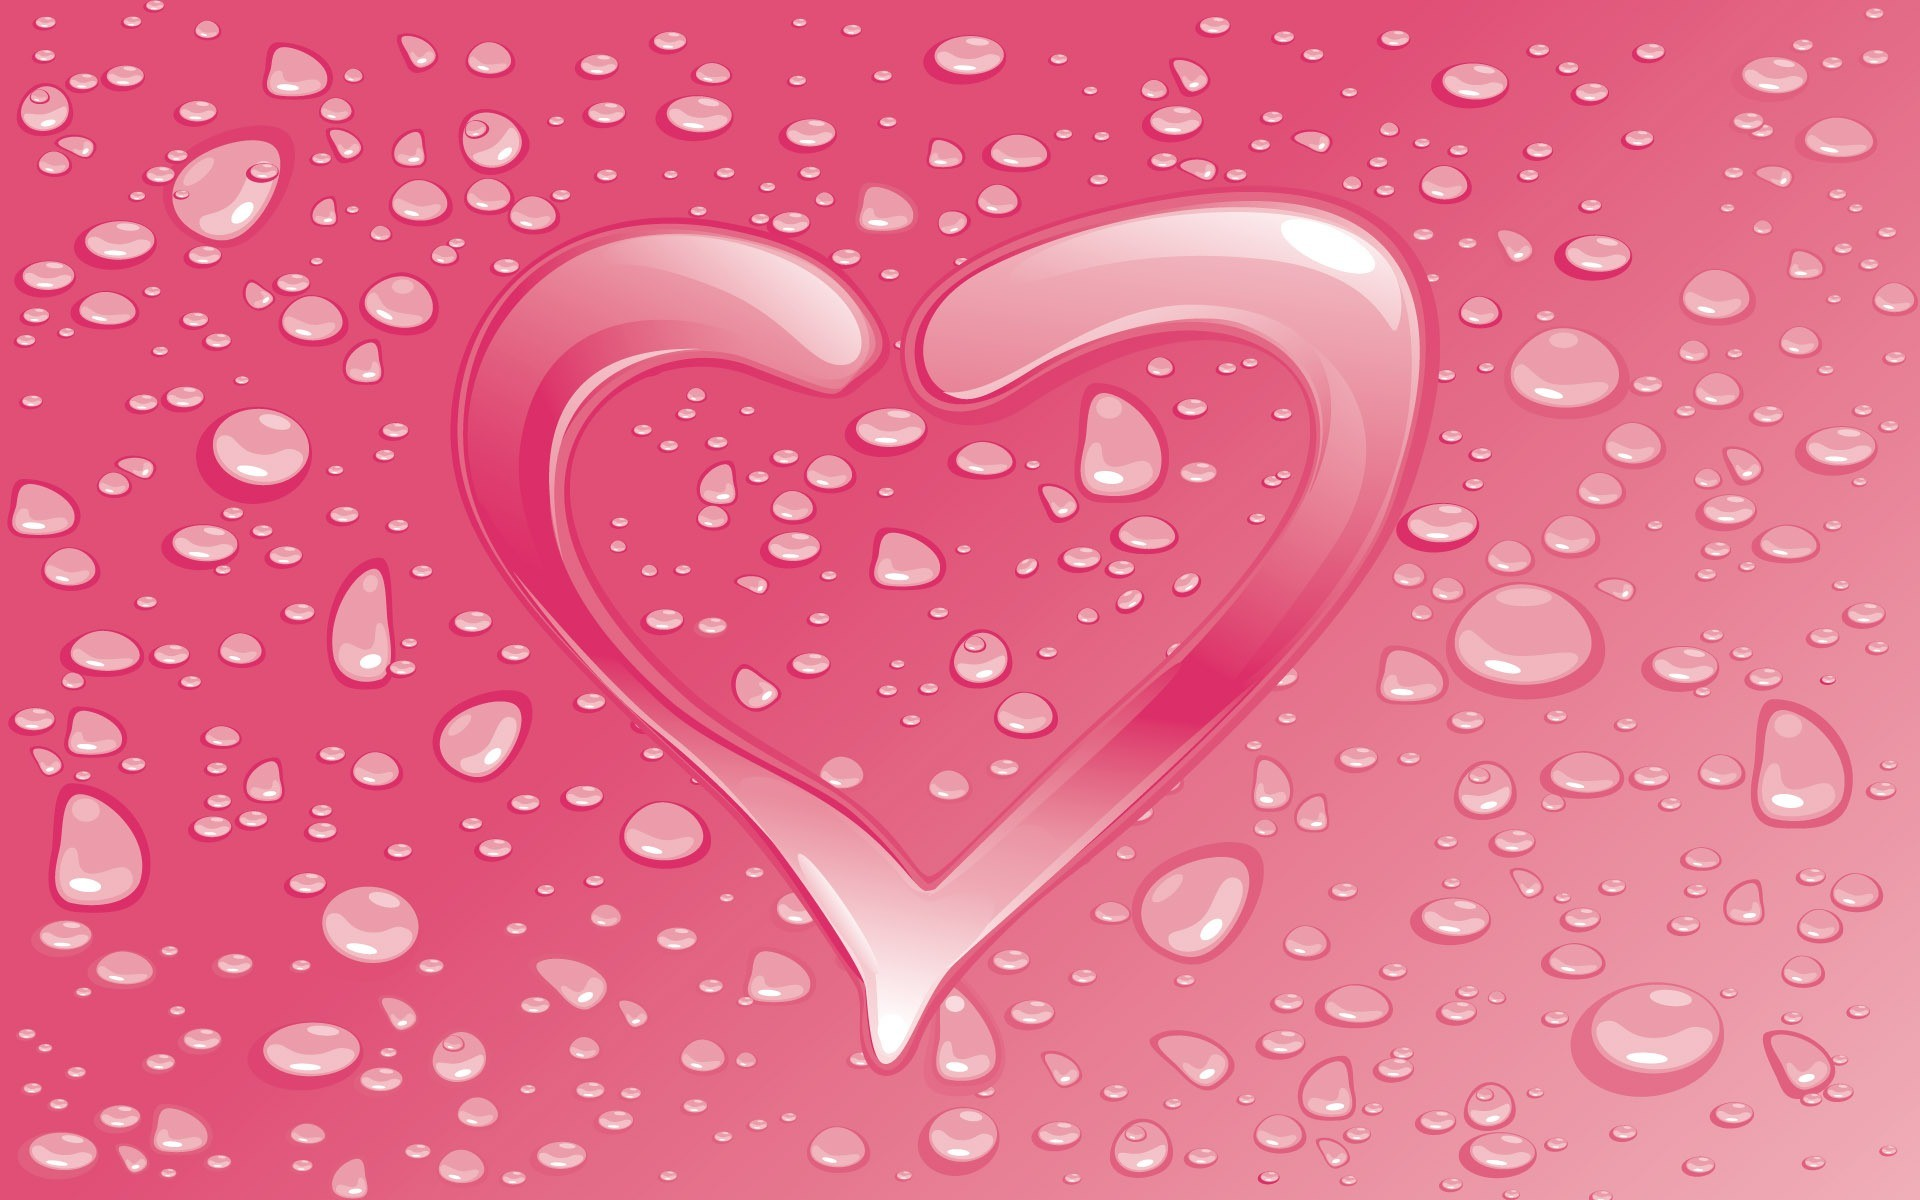 Free Hearts desktop wallpaper   Hearts wallpapers